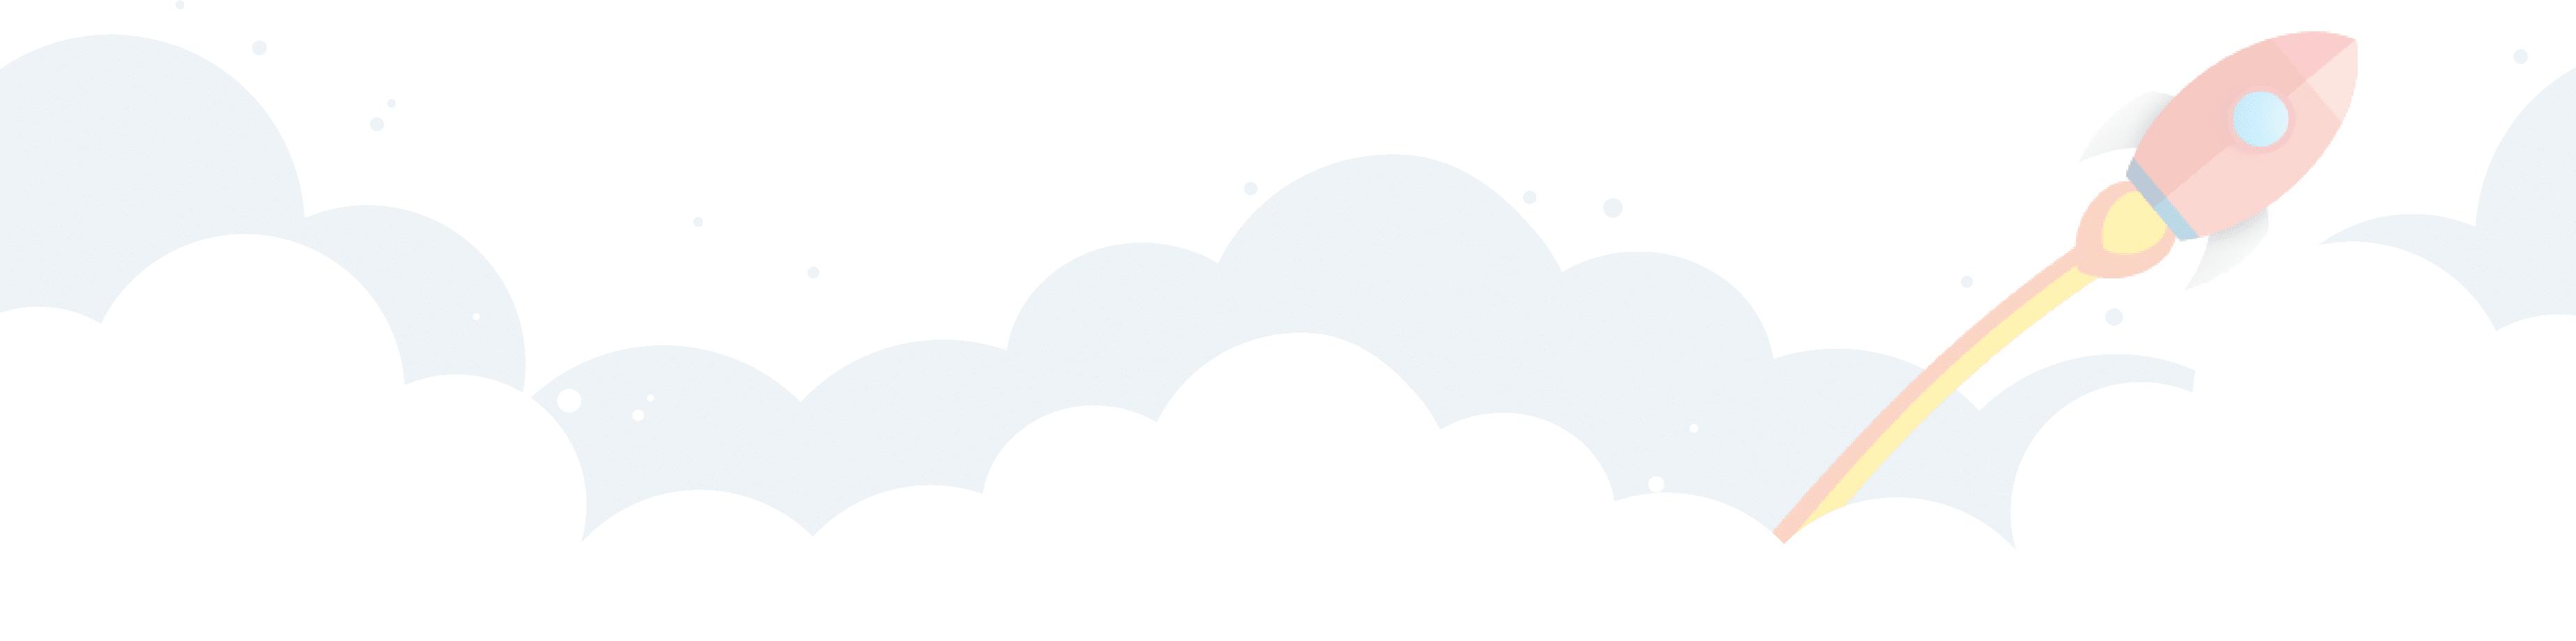 cohete con nubes